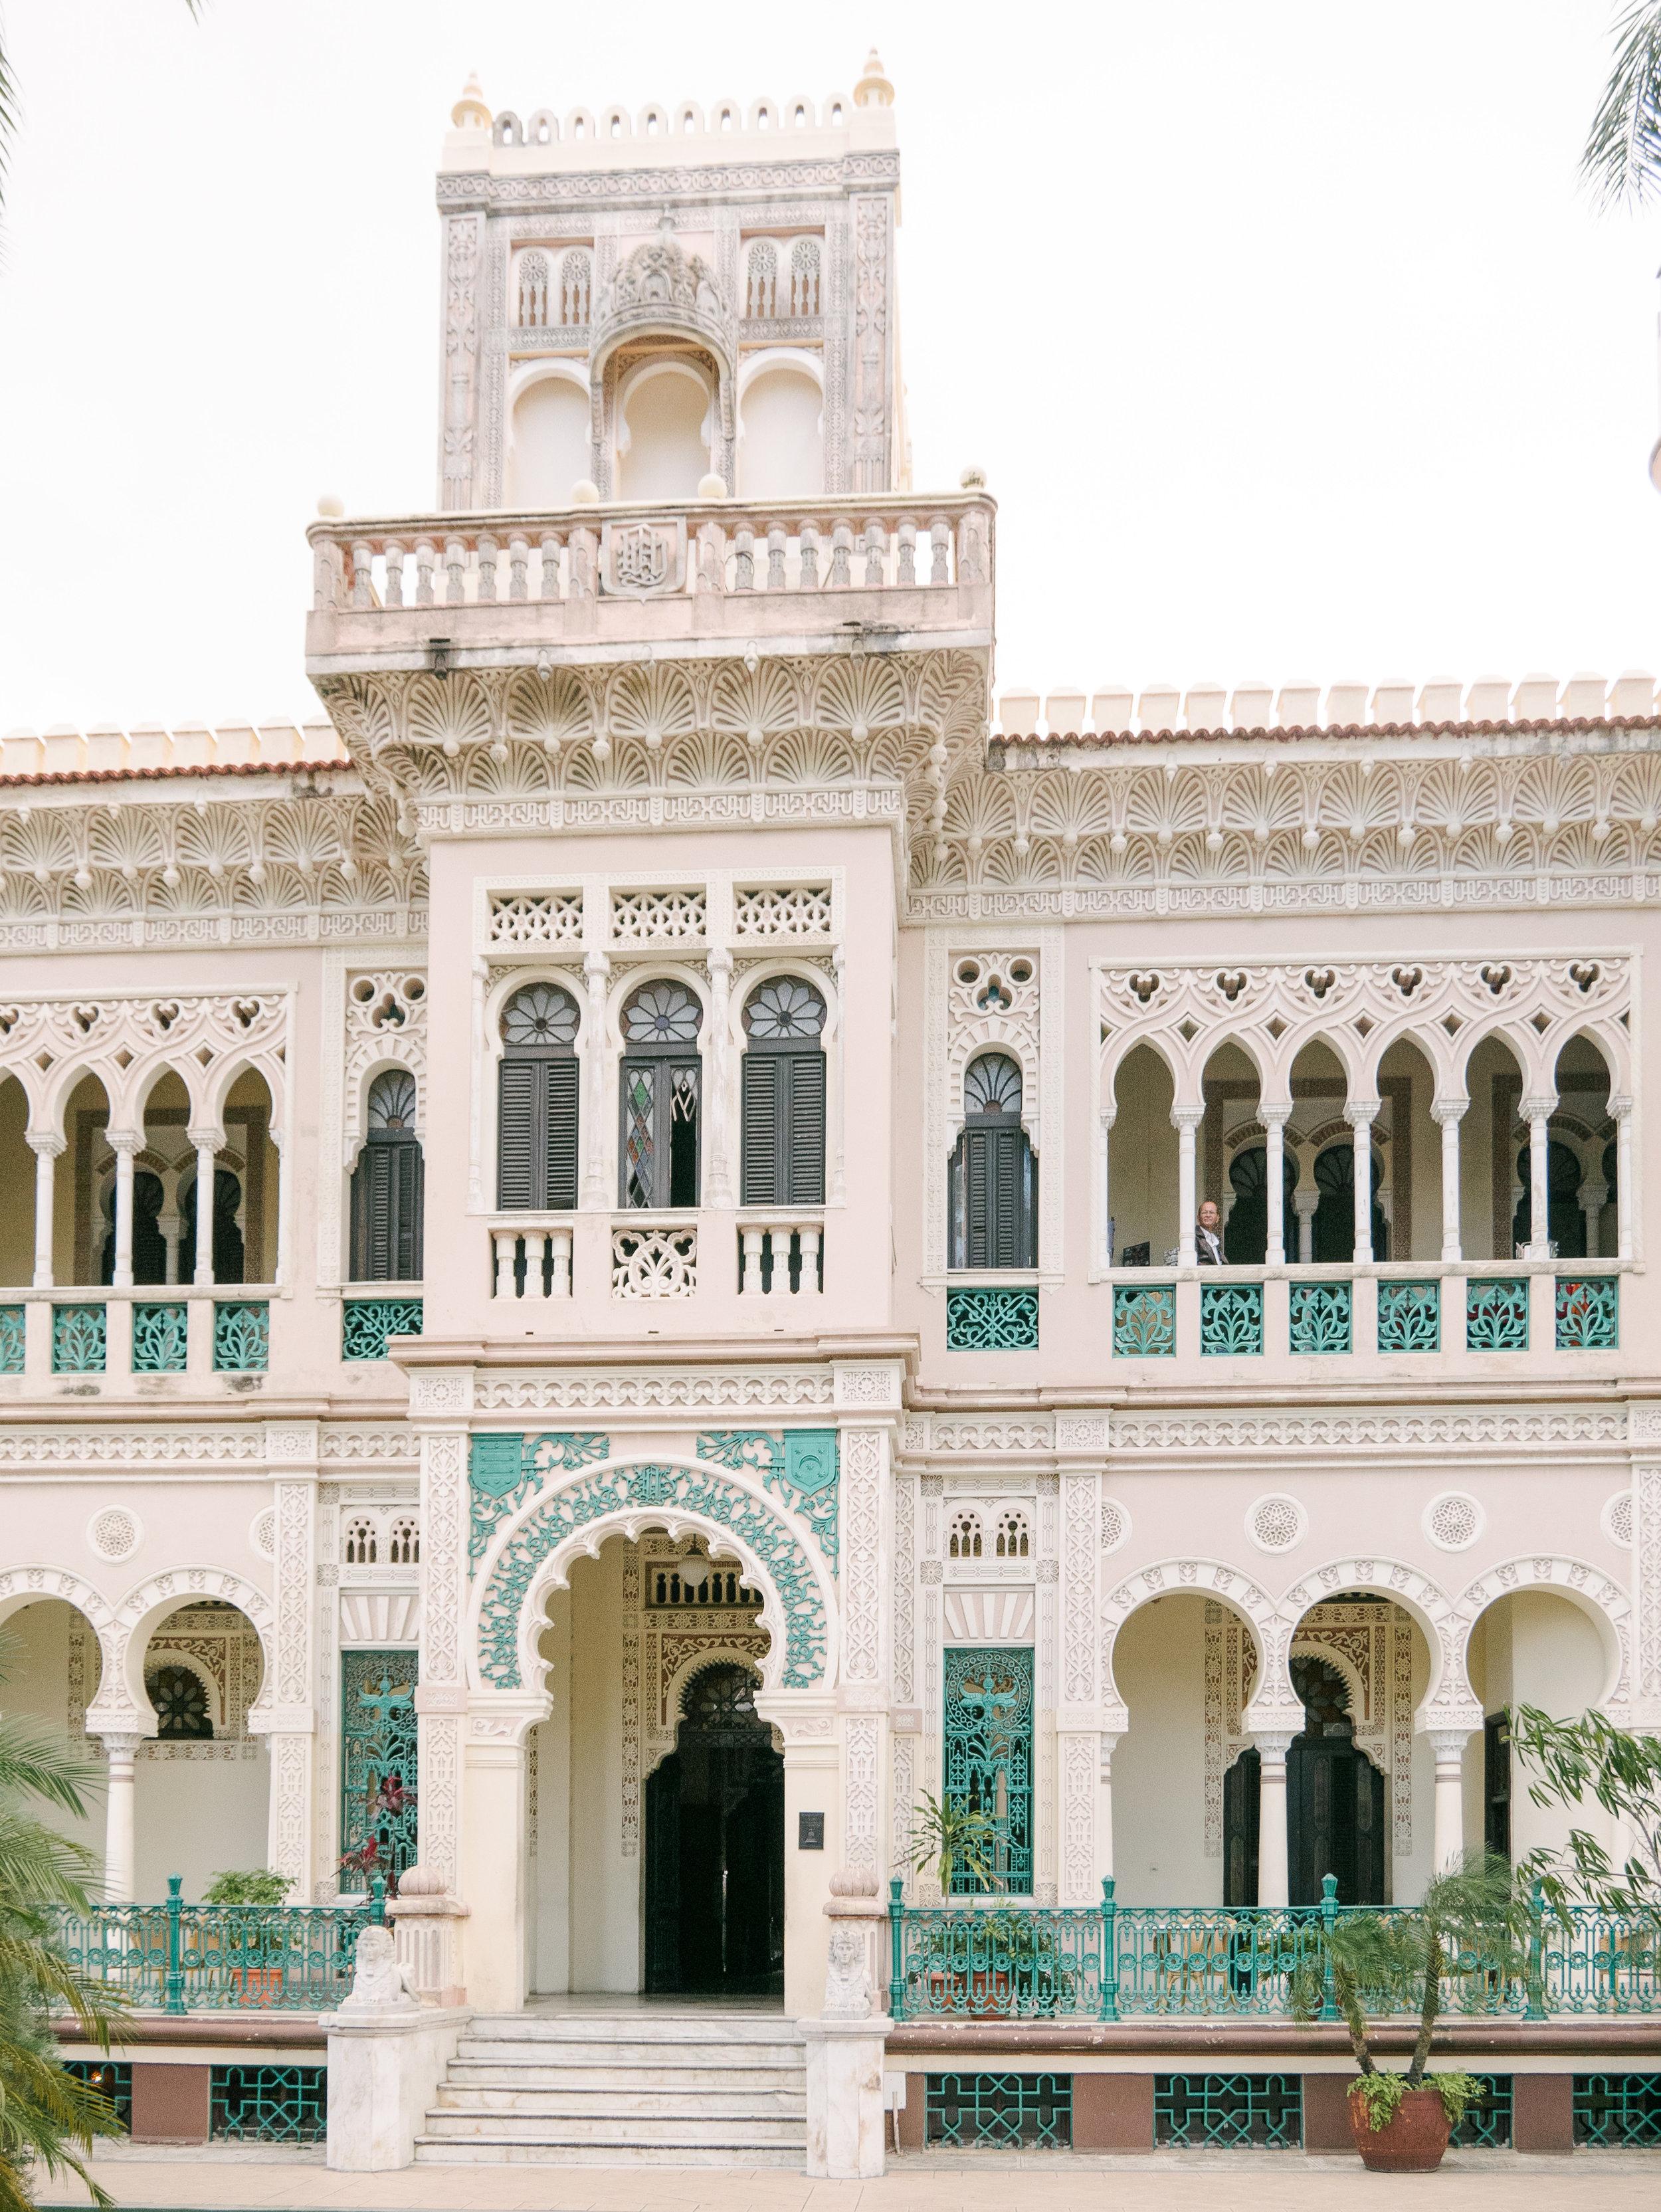 Palacio del Valle has Mudejar, Gothic, Romantic and Baroque influences